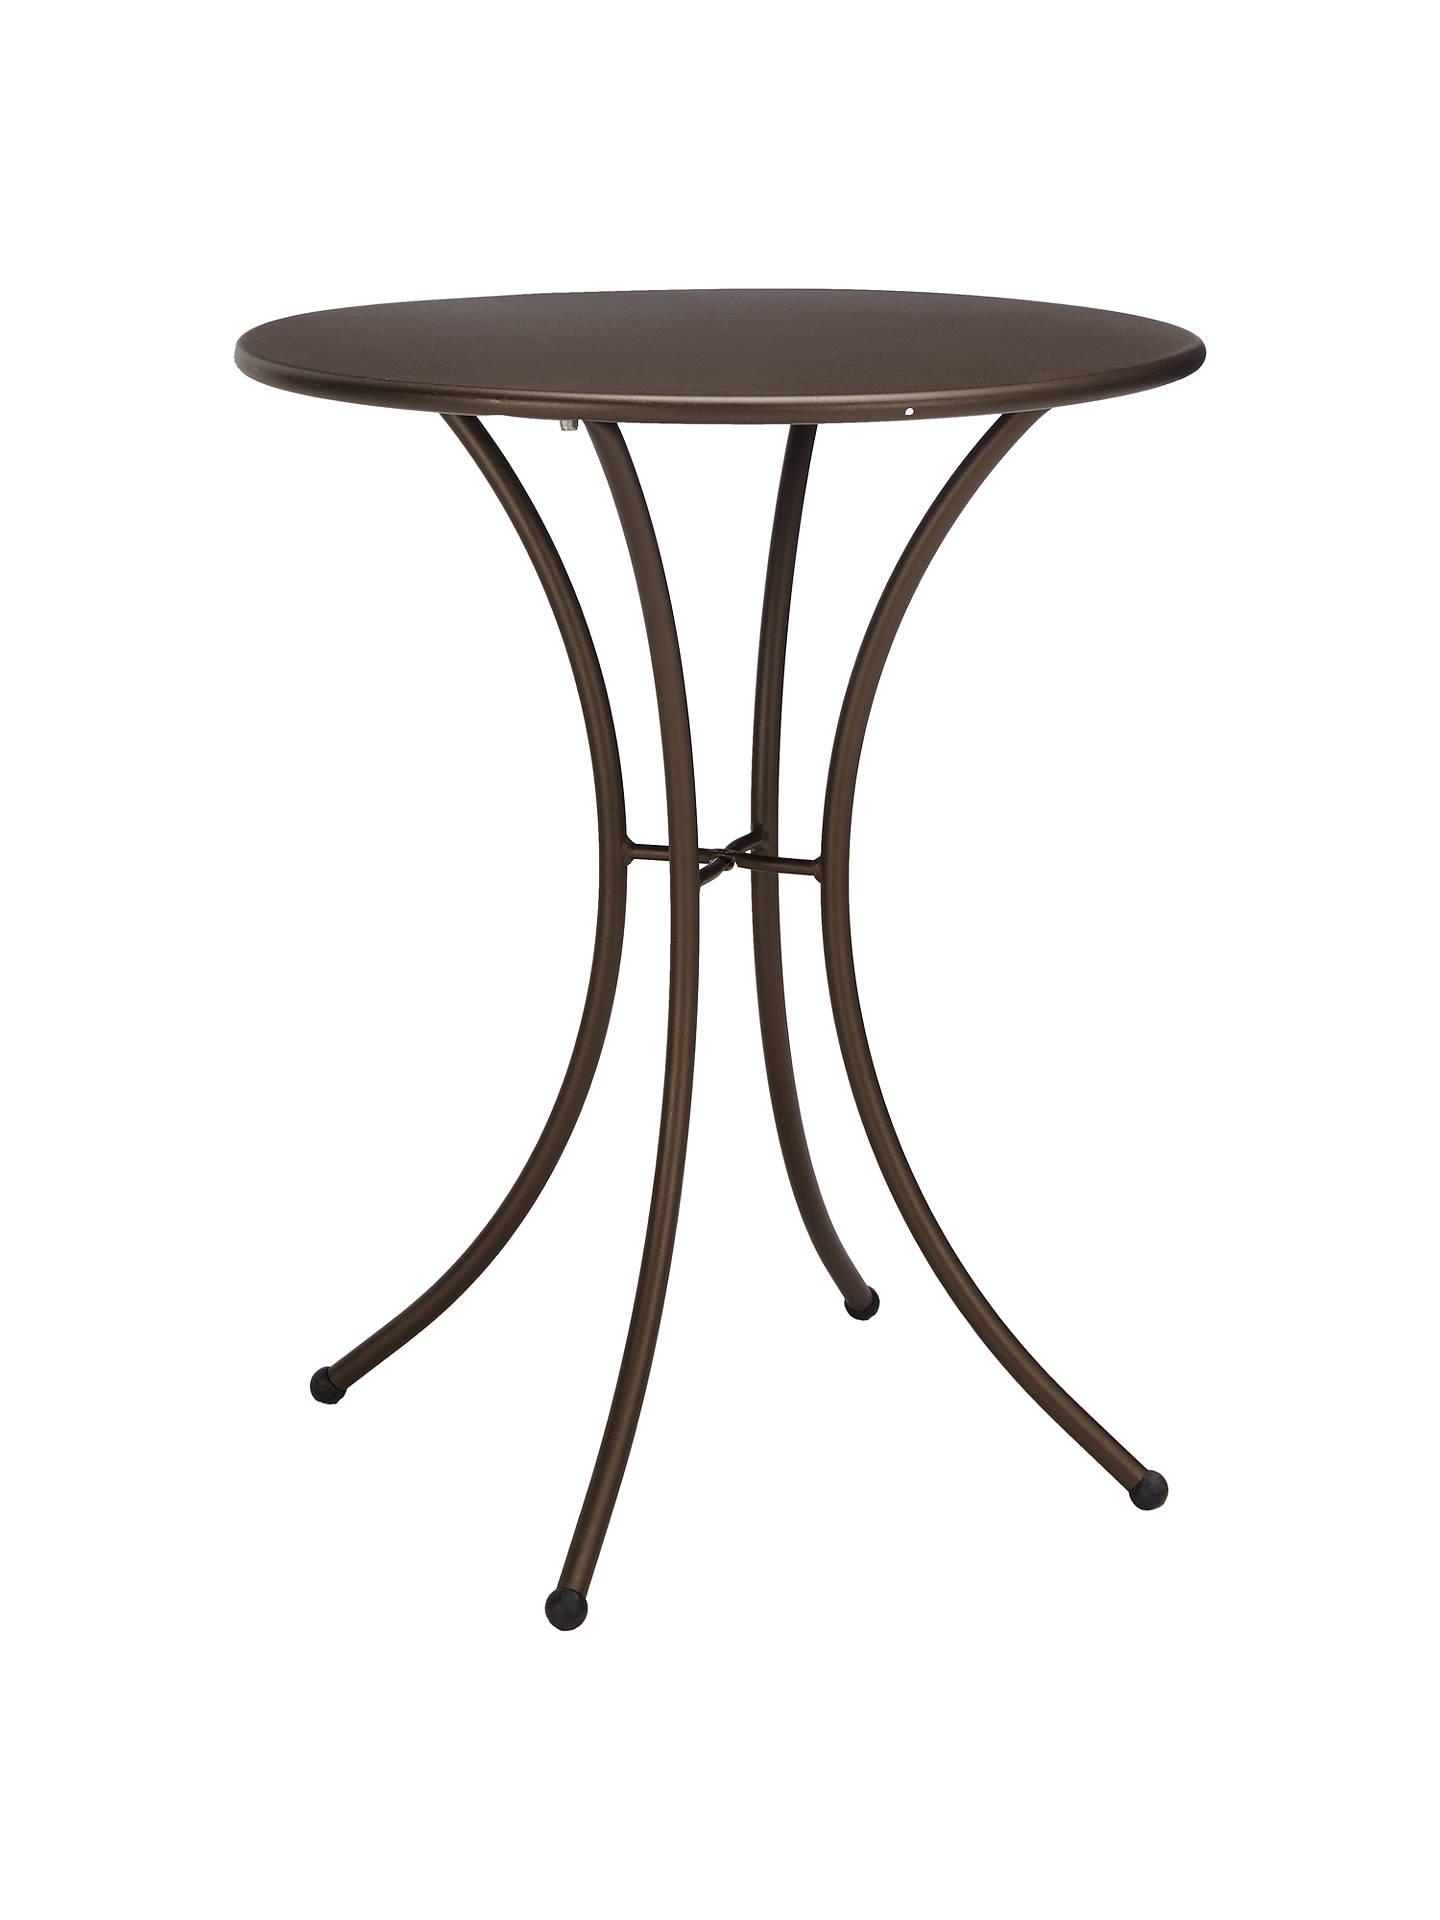 Awe Inspiring John Lewis Partners Ala Mesh Garden Table And Chairs Bistro Set Bronze Machost Co Dining Chair Design Ideas Machostcouk